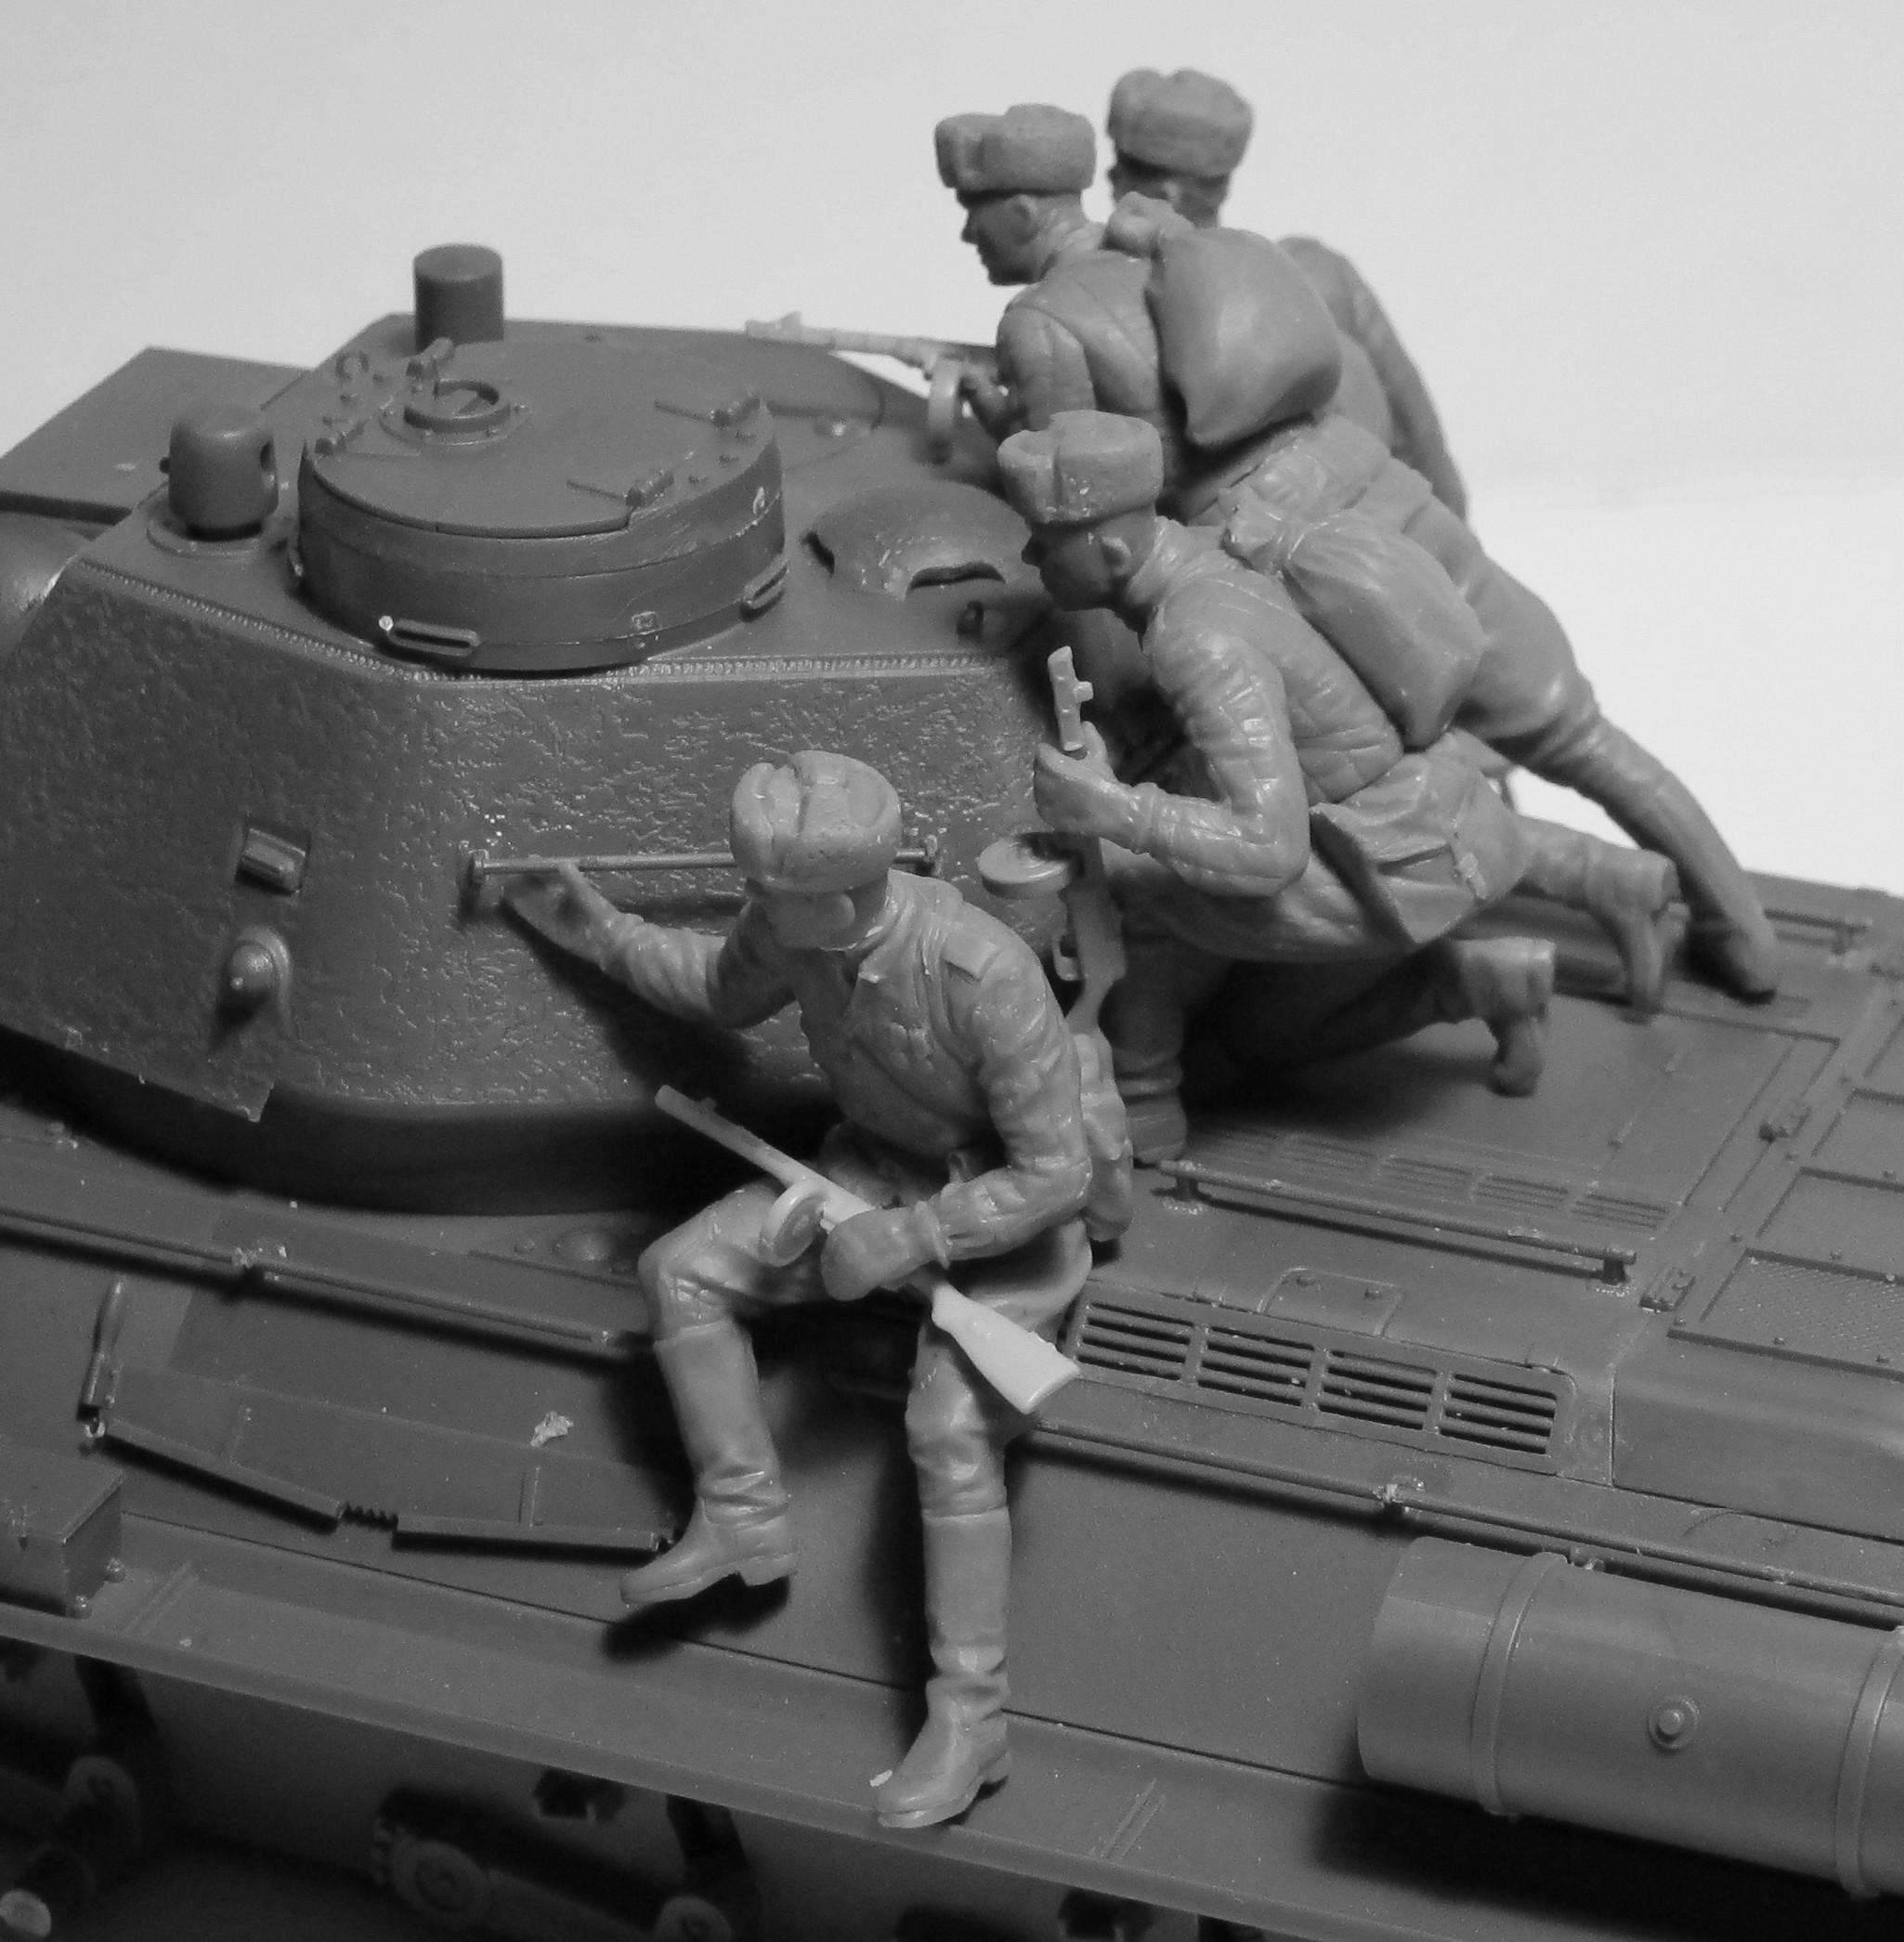 ICM 1/35 Russian/Soviet Tank Riders (1943-1945) (4 figures) (100% new molds) # 35640